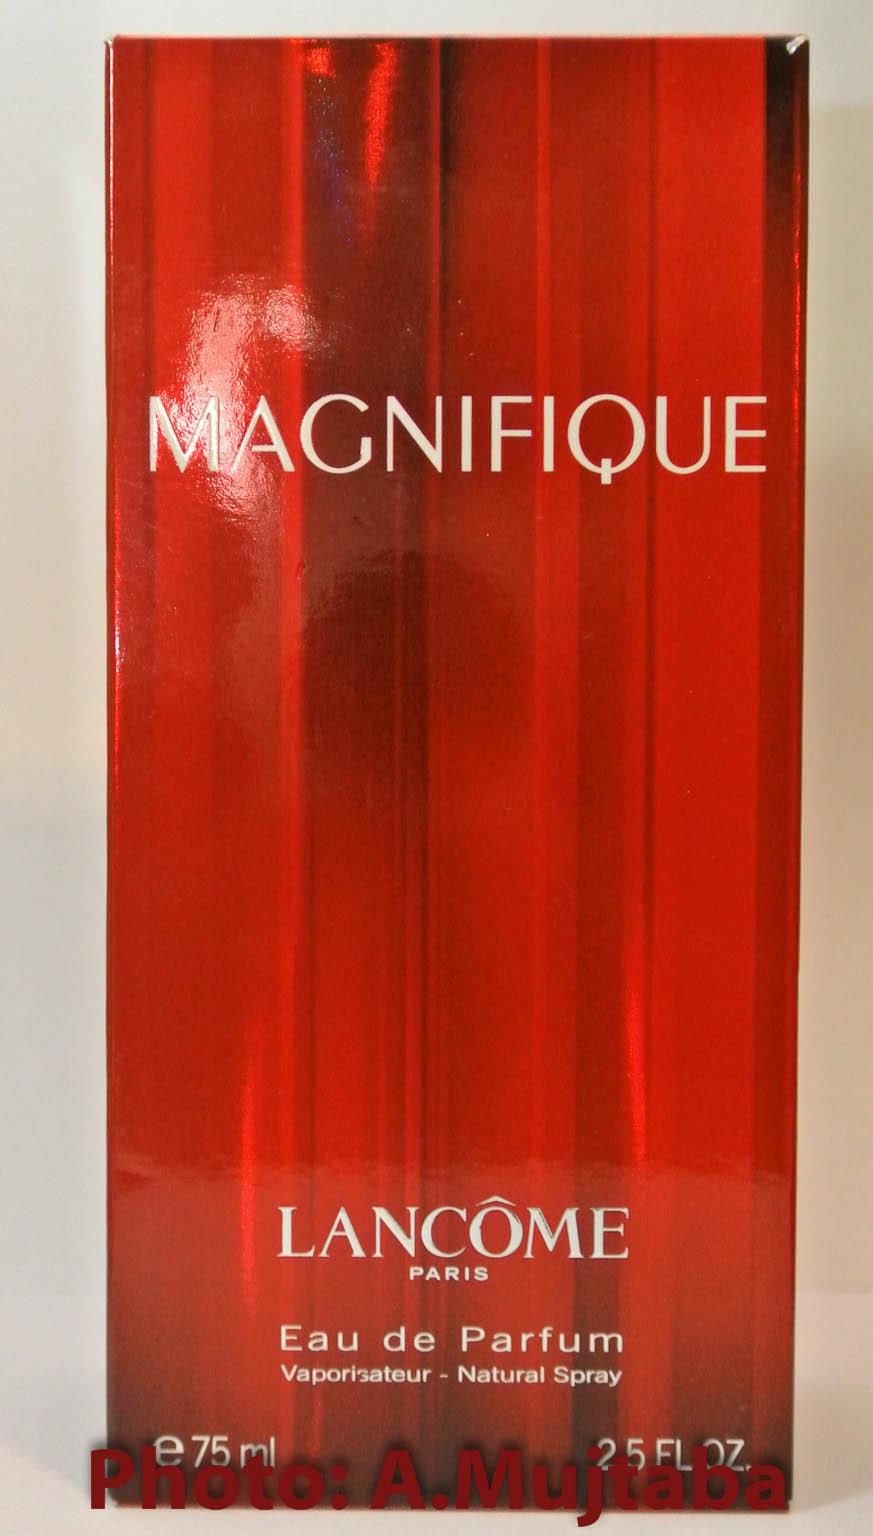 De ReviewLancôme ReviewLancôme ParfumPerfume Magnifiqueeau Magnifiqueeau De ParfumPerfume Connoisseur Connoisseur De ParfumPerfume Connoisseur Yfvb6ygI7